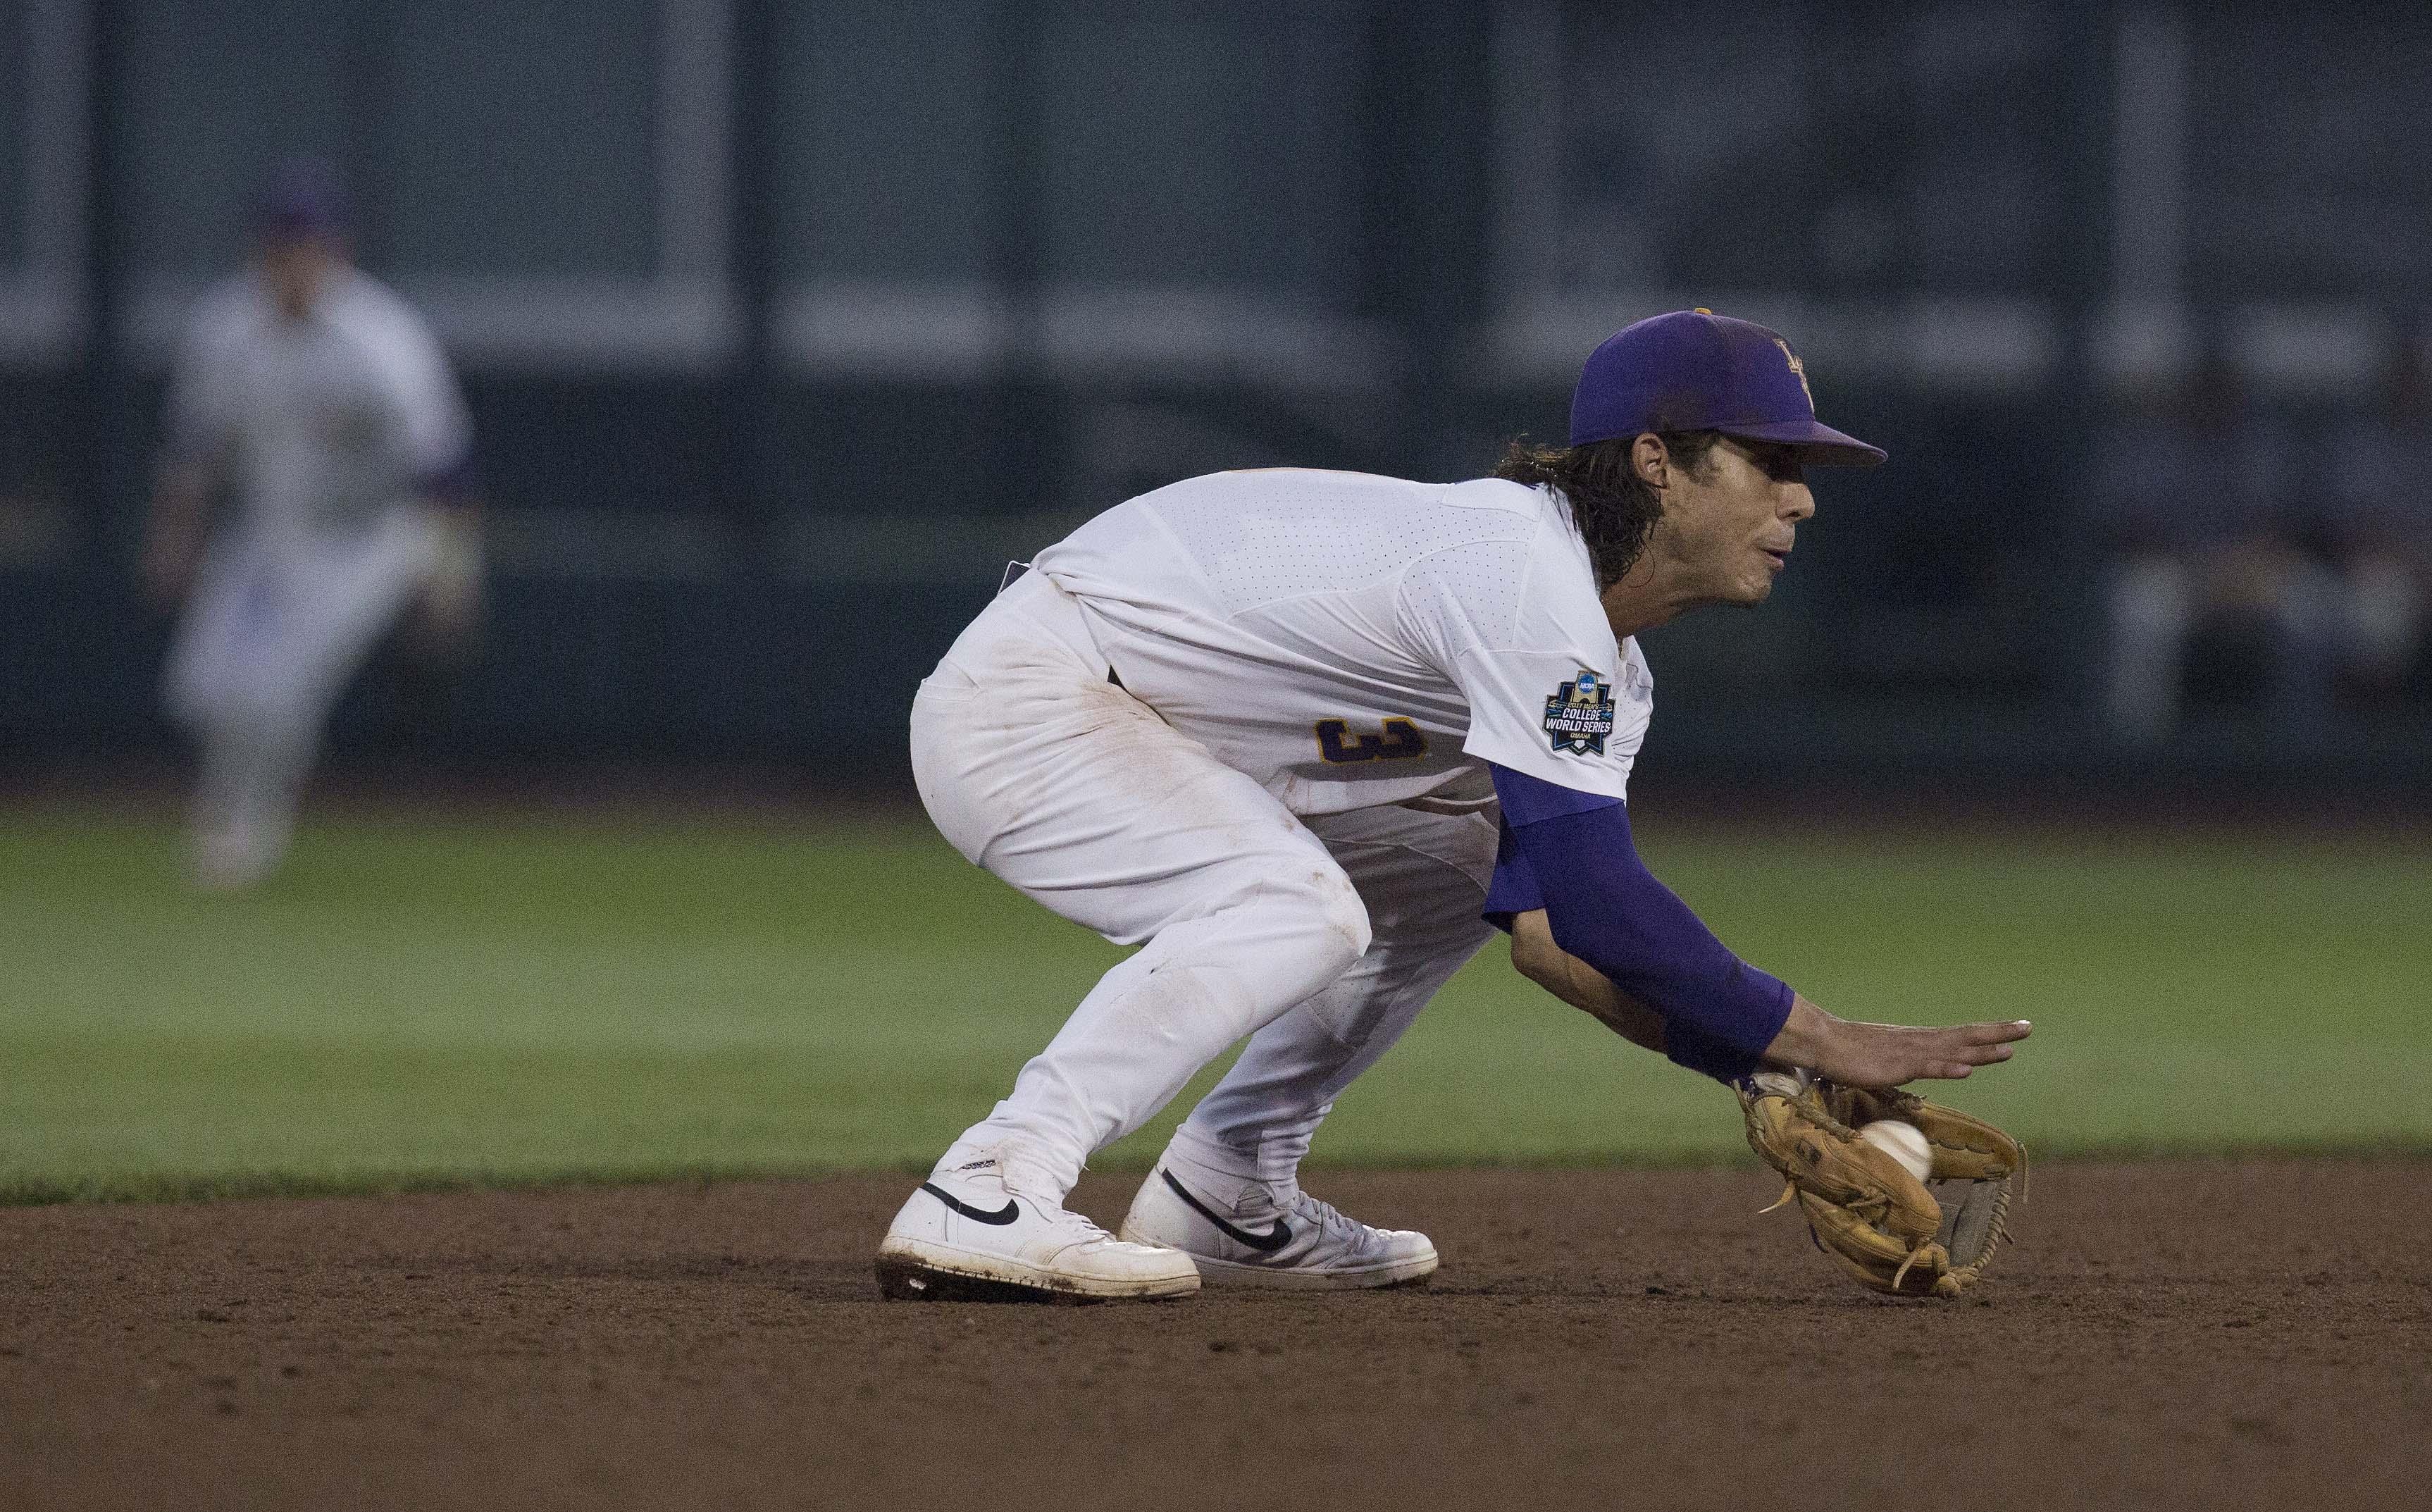 10118344-ncaa-baseball-college-world-series-florida-state-vs-lsu